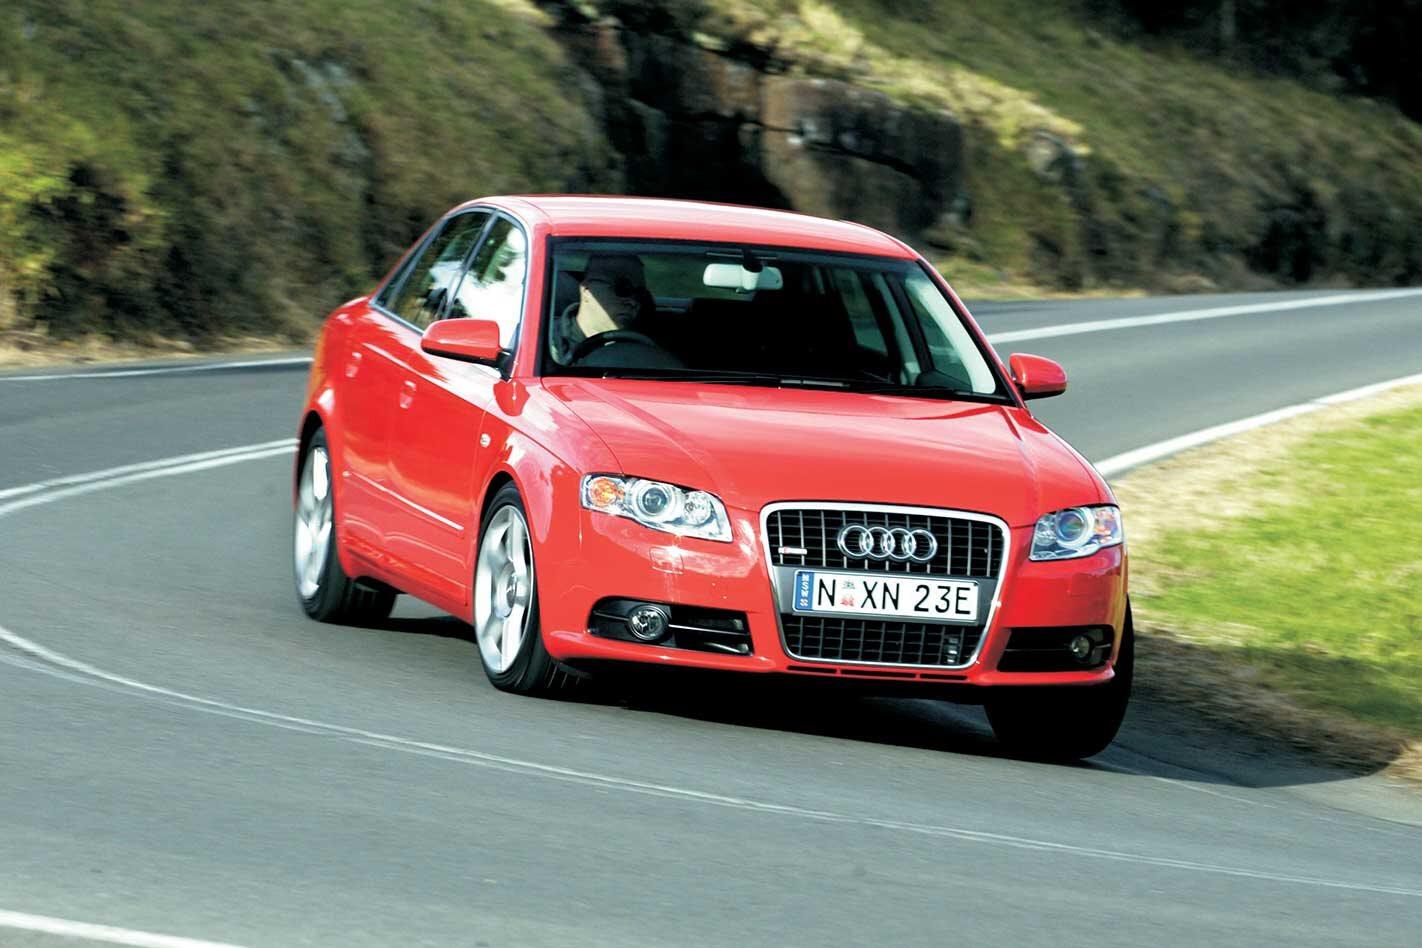 2006 Audi A4 TDI quattro review